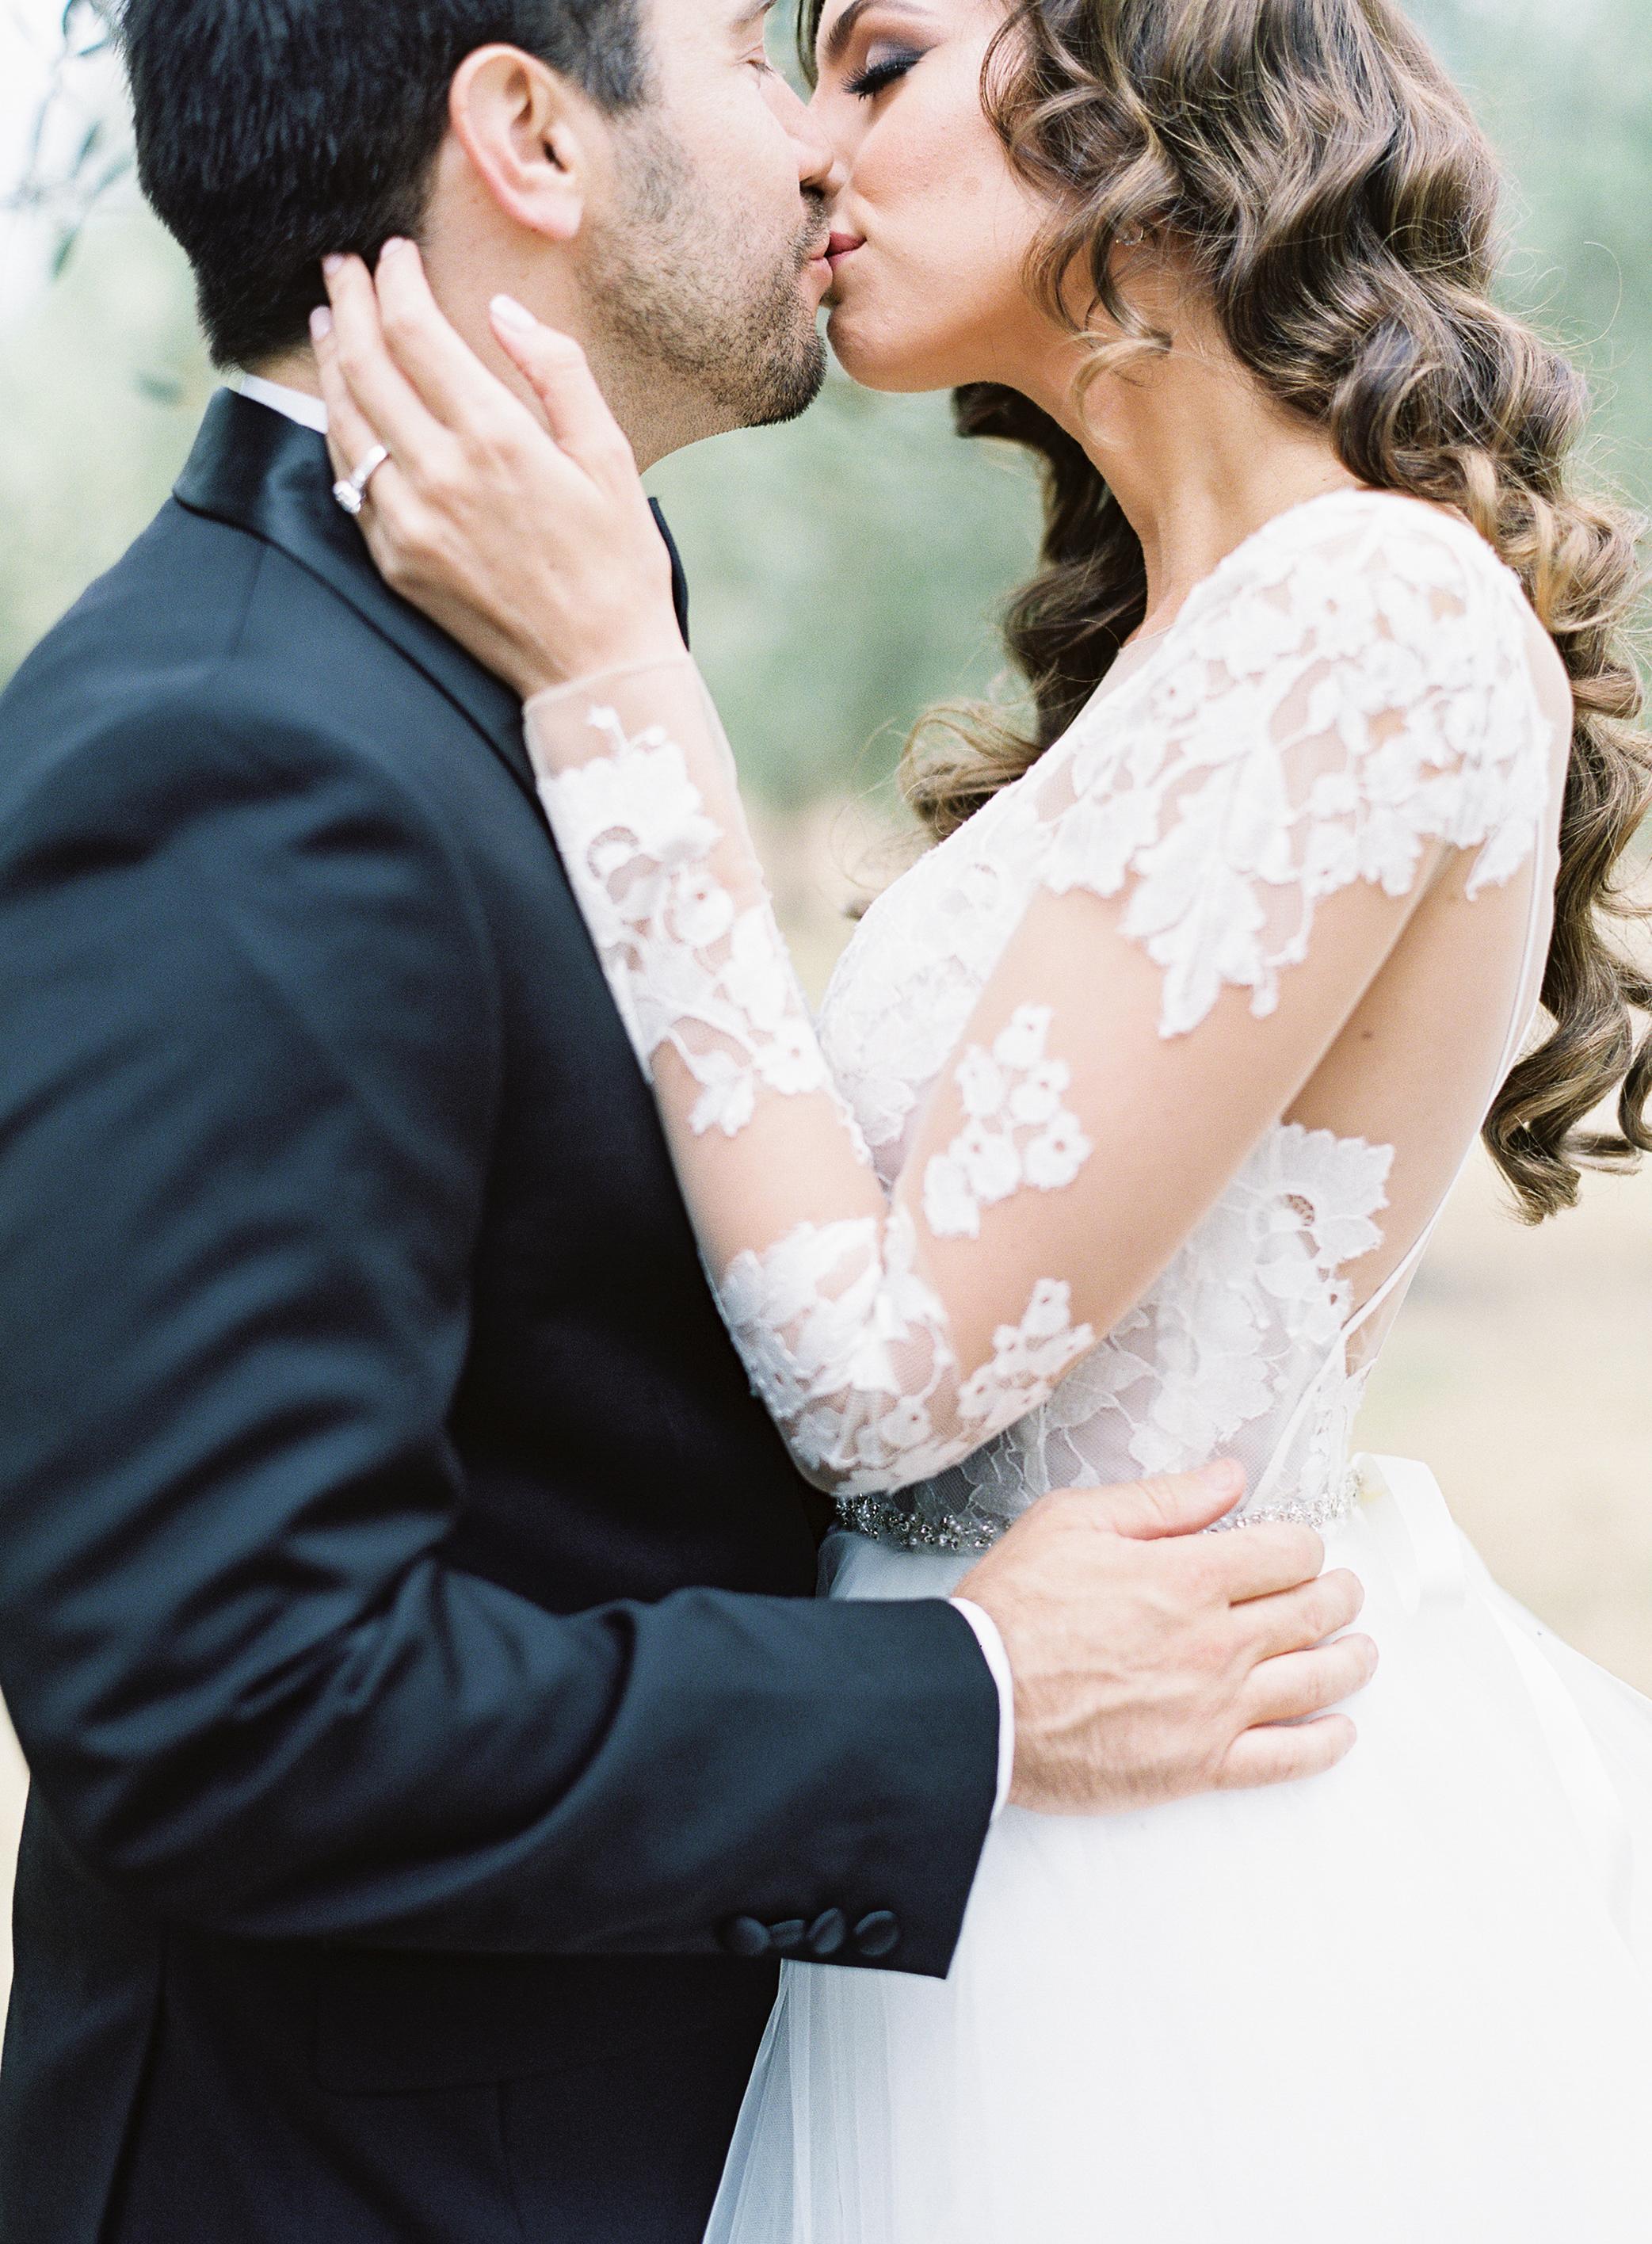 Meghan Mehan Photography   Fine Art Film Wedding Photographer   California   San Francisco   Napa   Sonoma   Santa Barbara   Big Sur   Destination Wedding Photographer 057.jpg